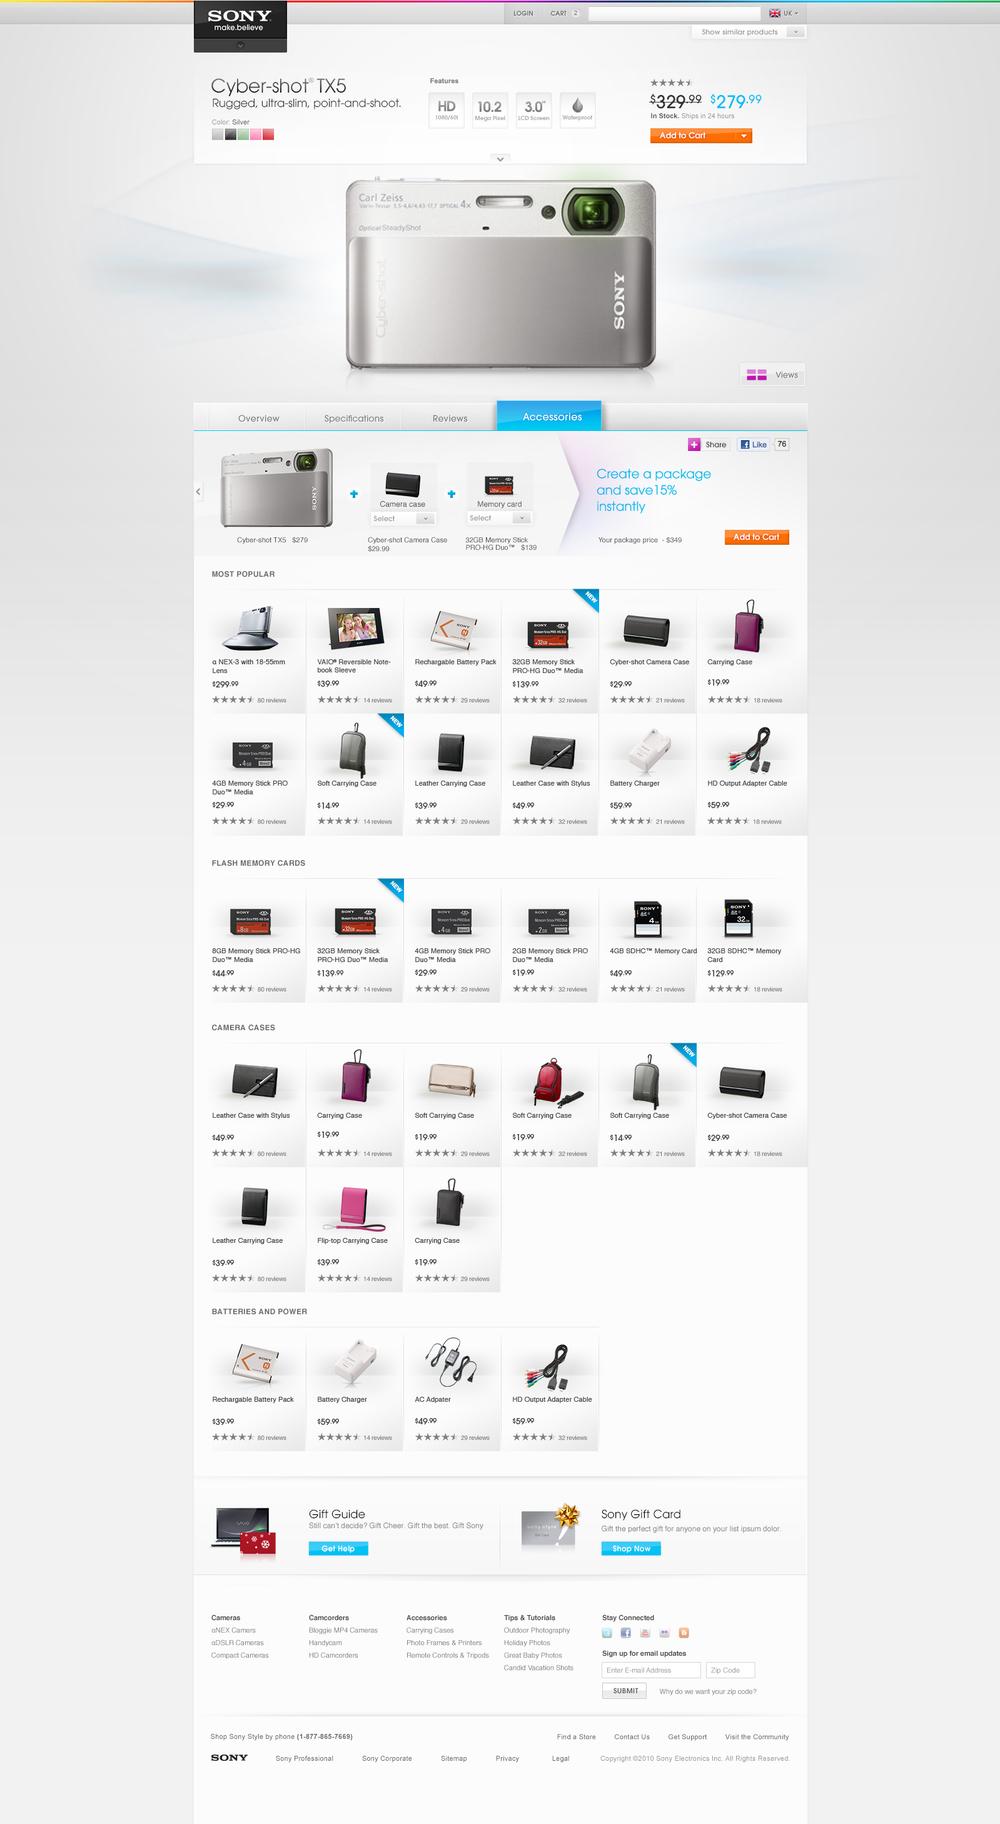 Product_ProdDetail_CybershotTX5_Accessories_zm_v5.jpg